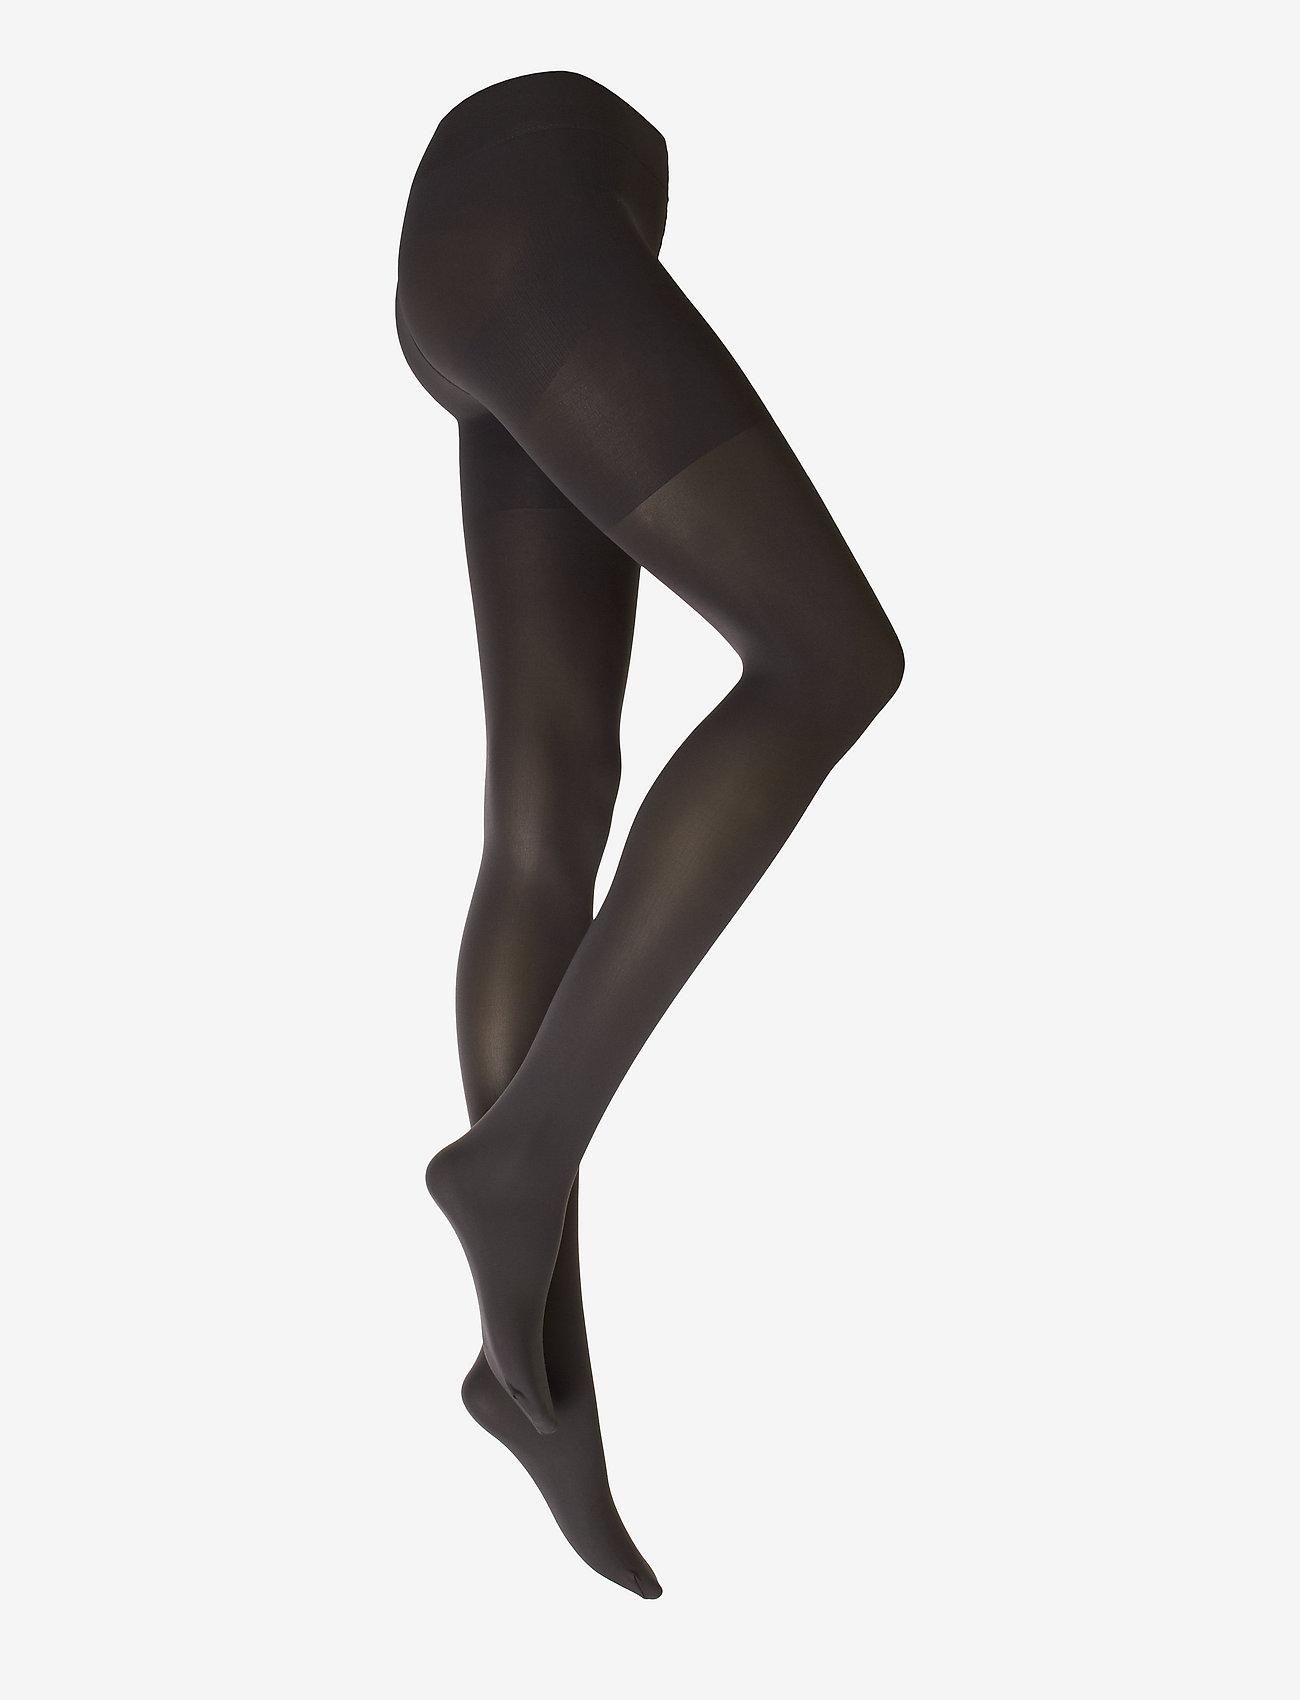 Esprit Socks - Shaping 80 TI - collants - stone grey - 0